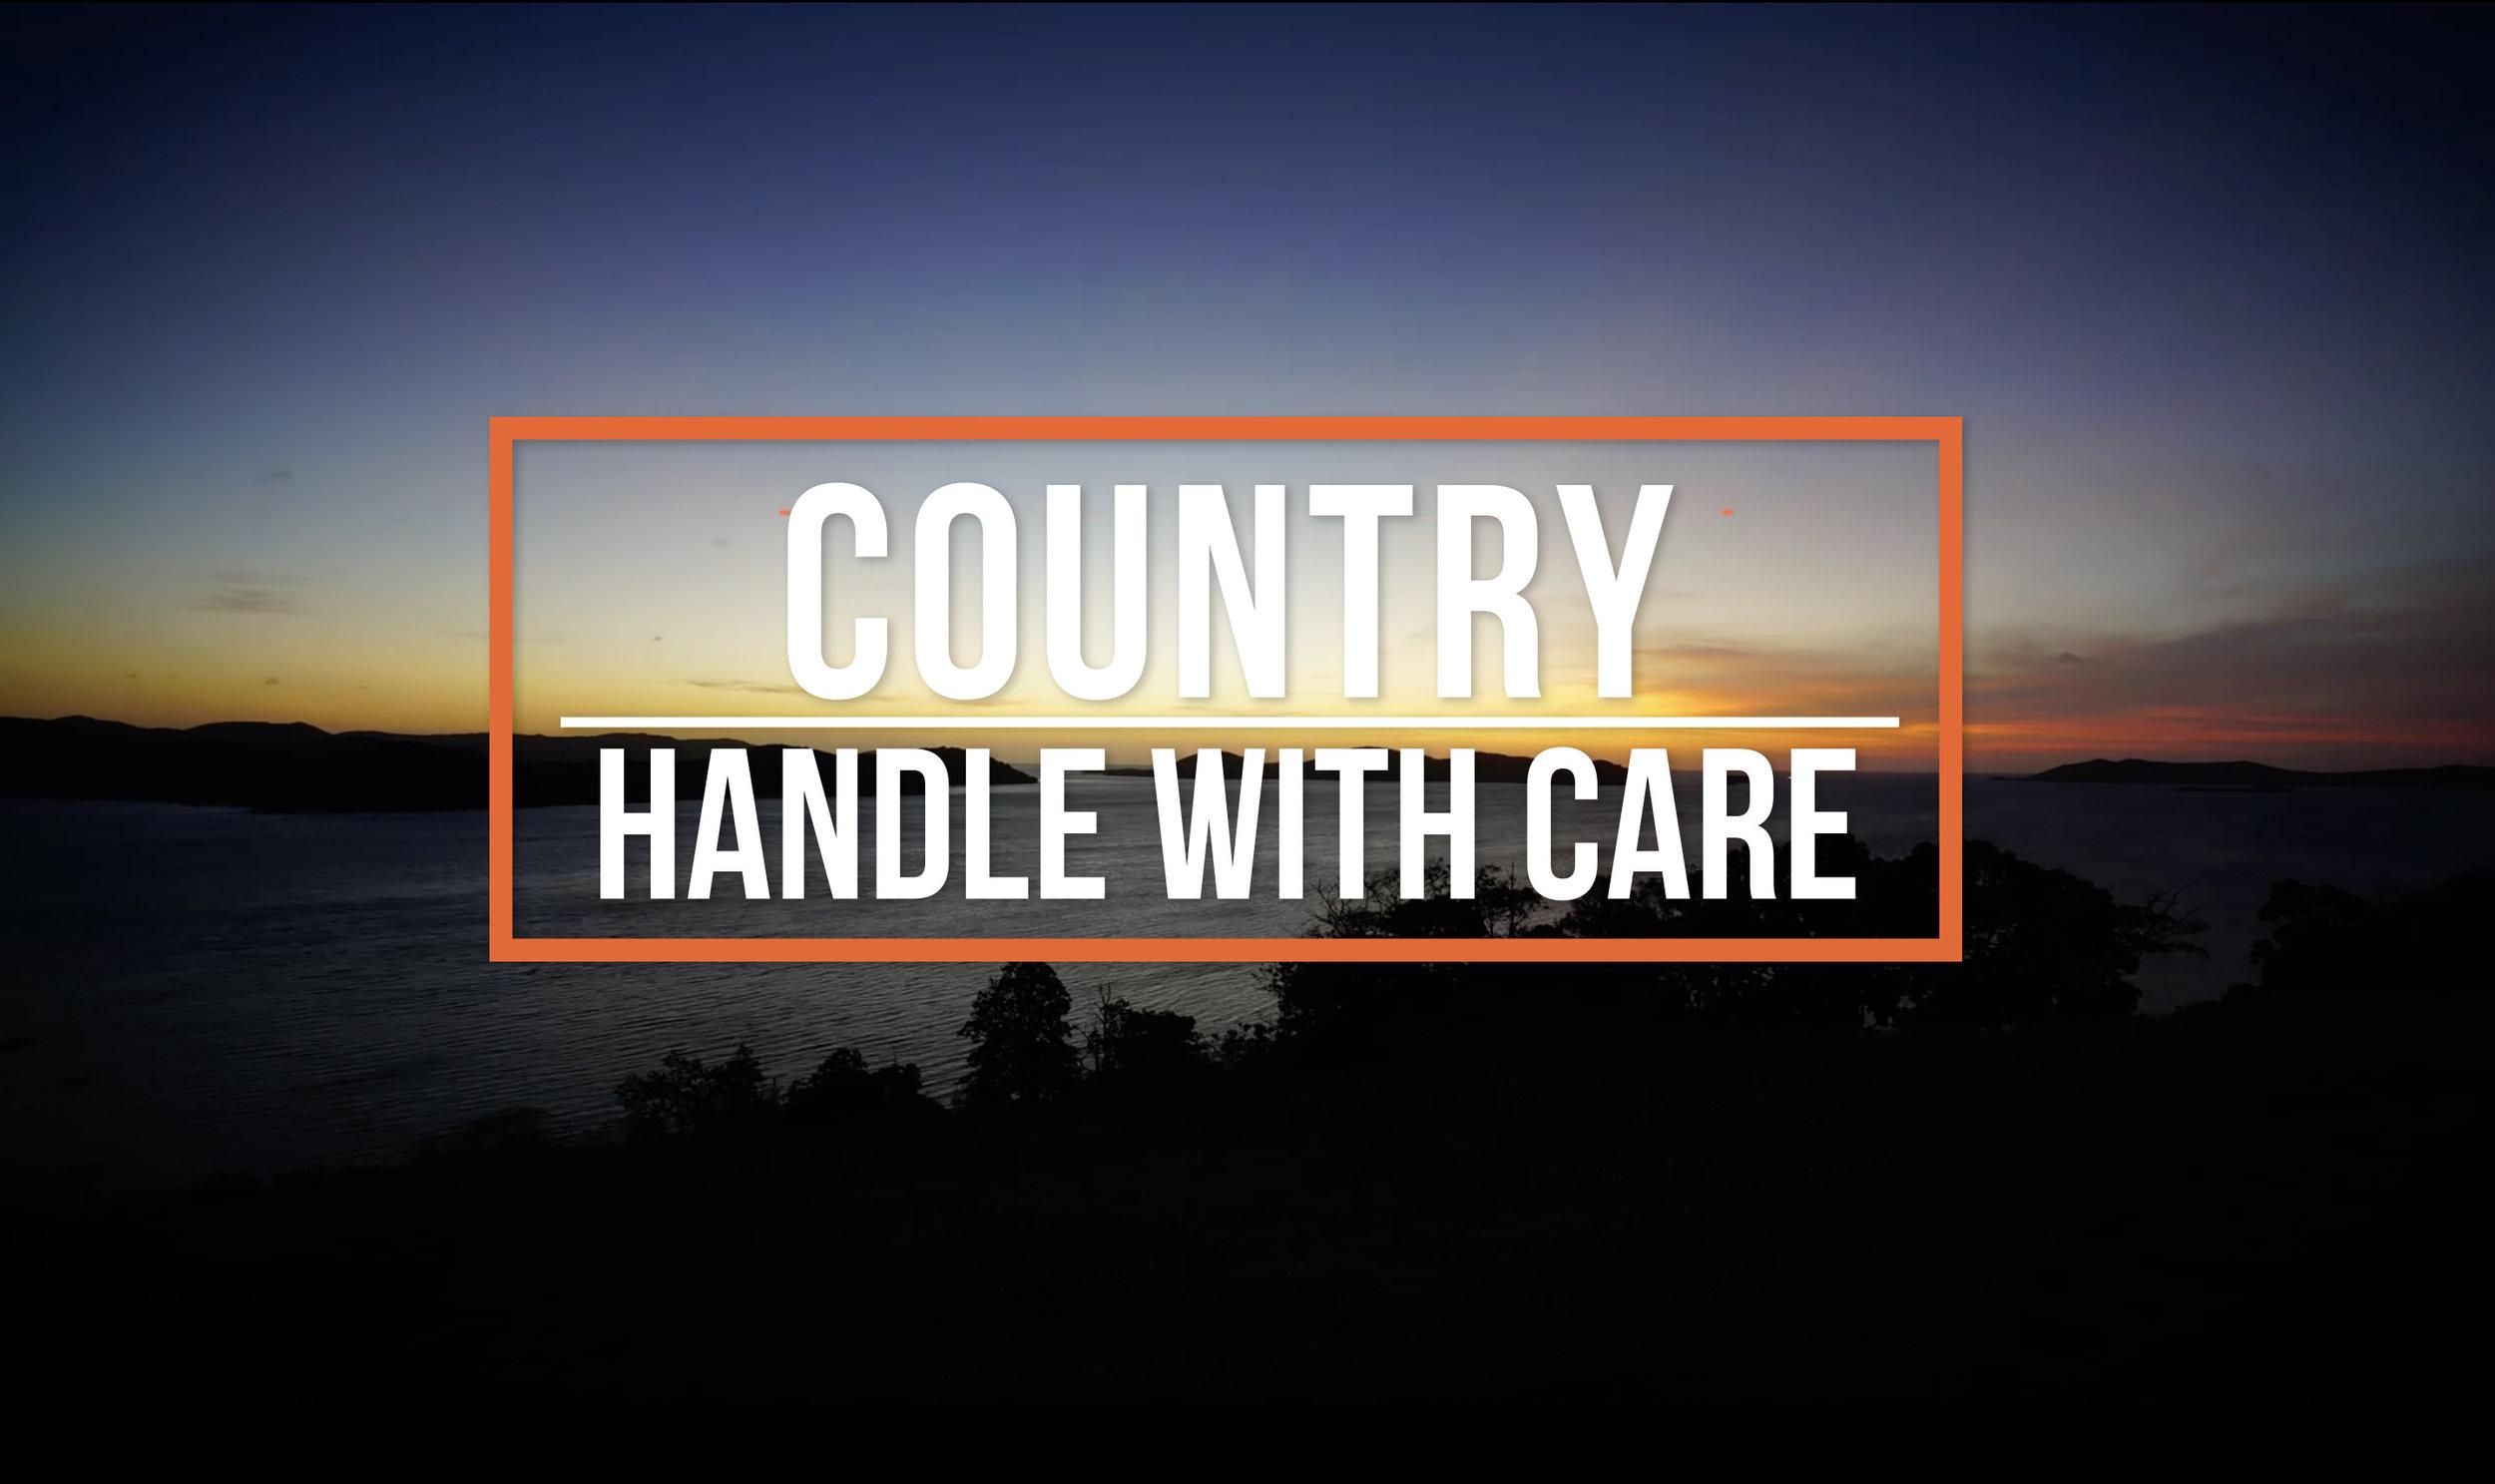 HWCare-In-Line-on-Video-BG-Orange.jpg